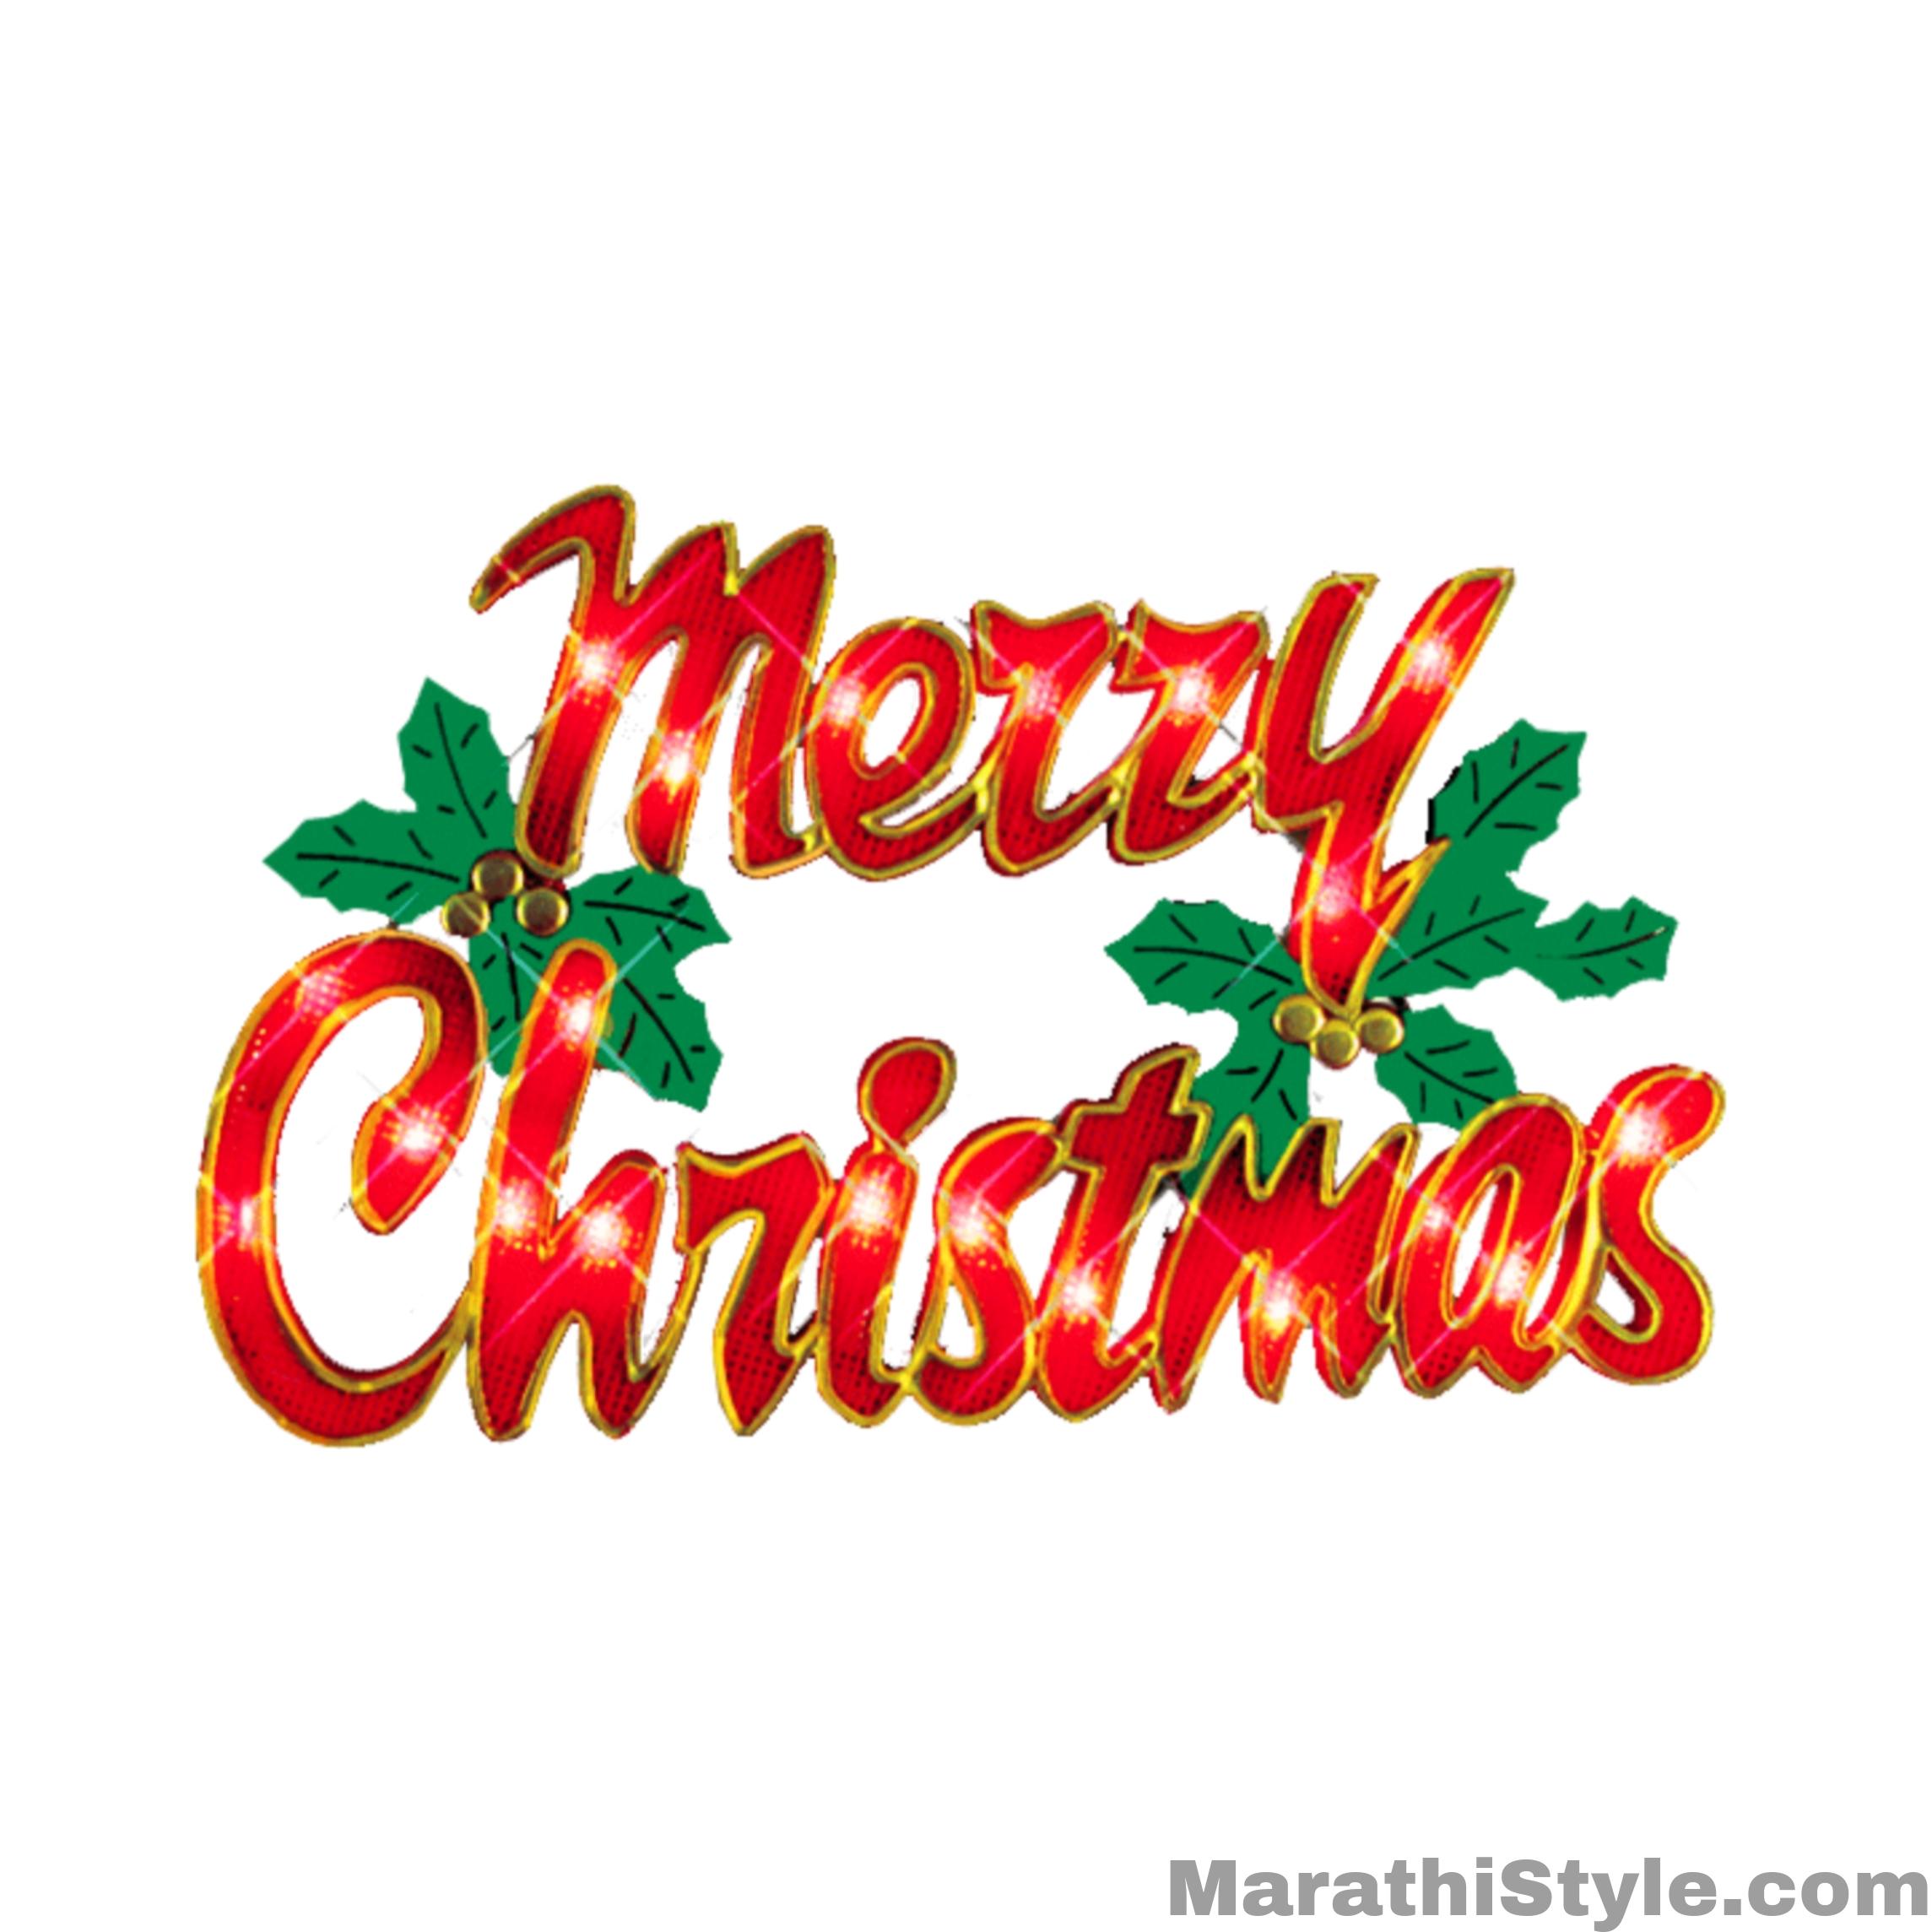 ख्रिसमस | नाताळ सणाच्या शुभेच्छा | Christmas Wishes in Marathi